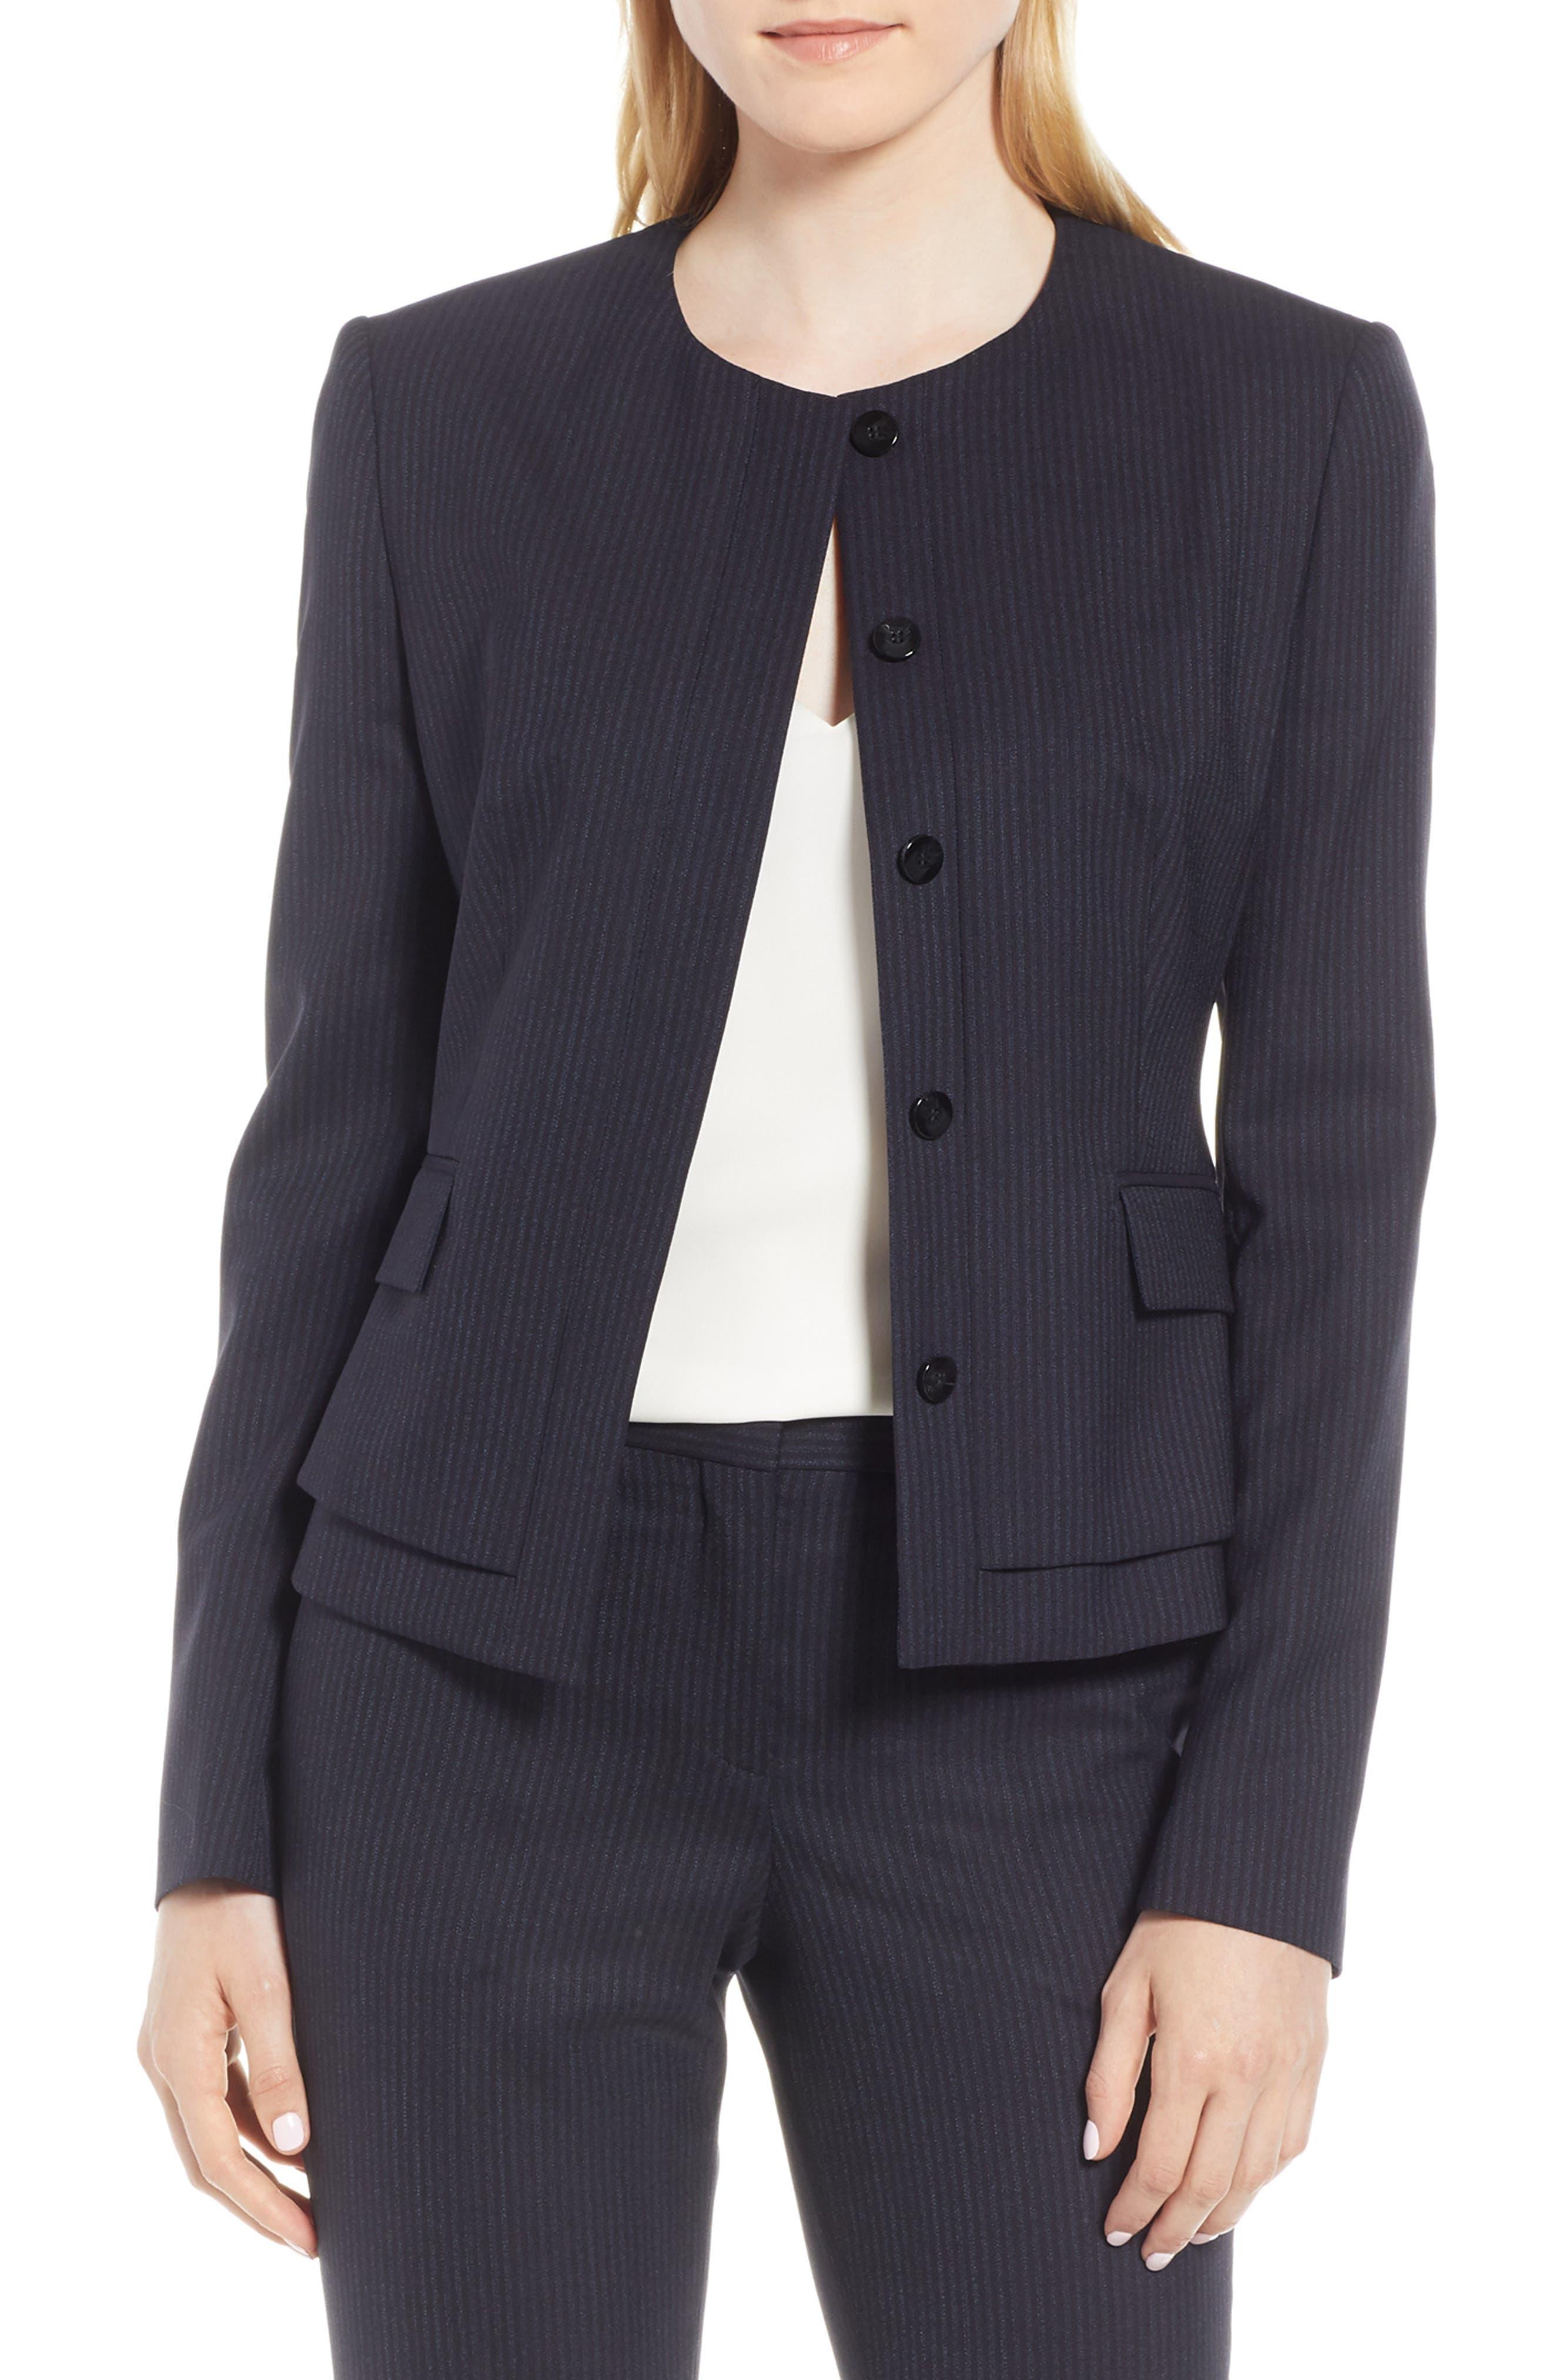 Jasyma Tonal Stripe Stretch Wool Suit Jacket,                             Main thumbnail 1, color,                             NAVY FANTASY